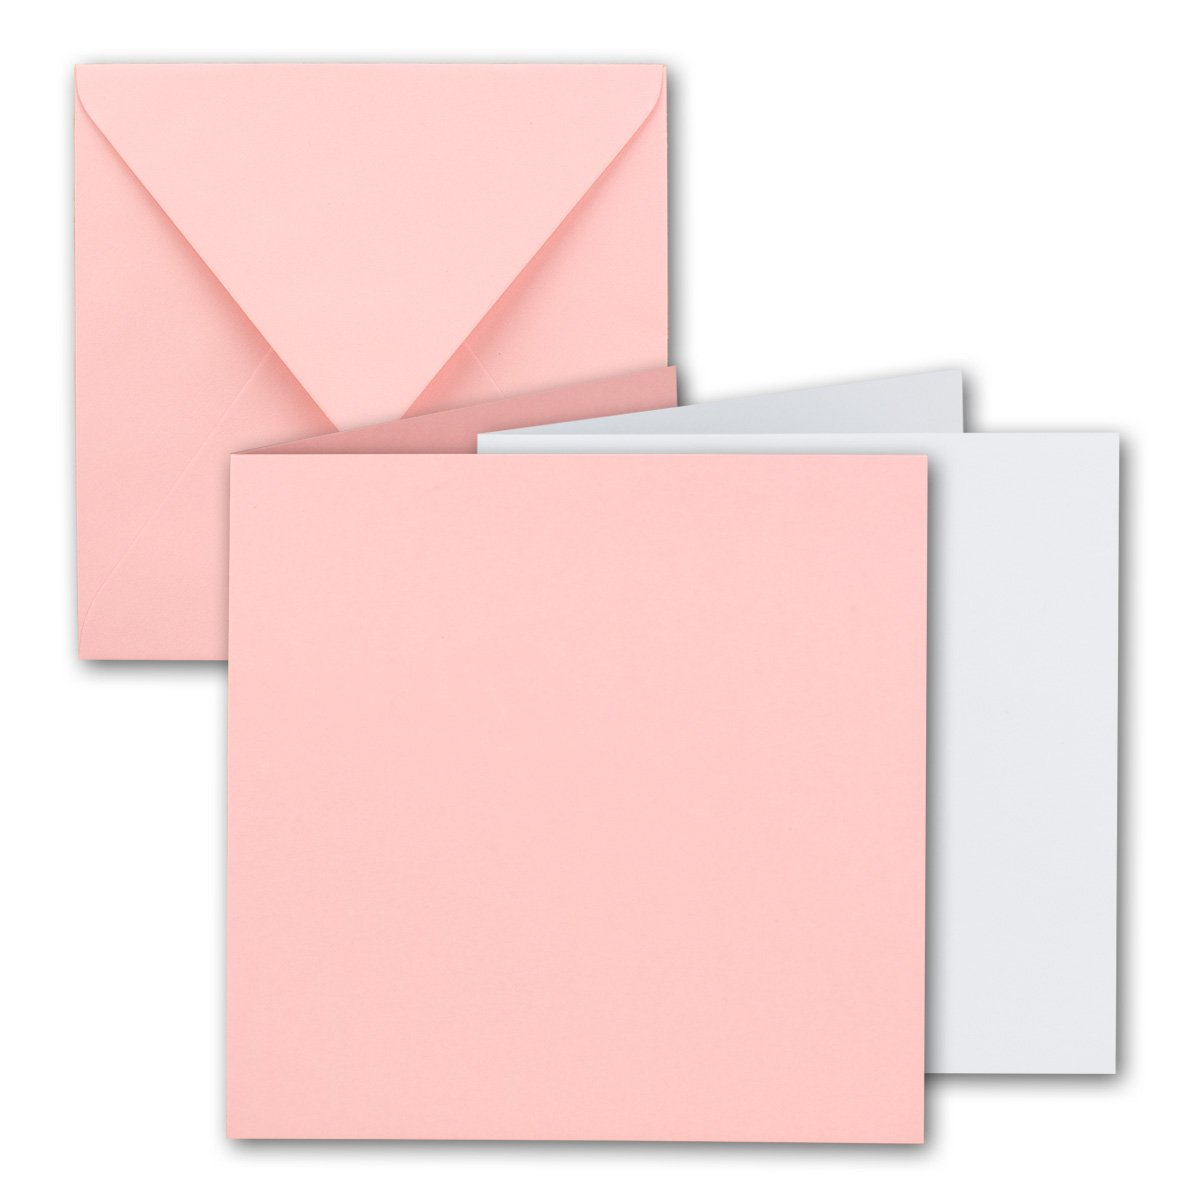 Quadratisches Falt-Karten-Set I 15 x 15 cm - mit Brief-Umschlägen Brief-Umschlägen Brief-Umschlägen & Einlege-Blätter I Royalblau I 75 Stück I KomplettpaketI Qualitätsmarke  FarbenFroh® von GUSTAV NEUSER® B07D4GMKBQ | Bunt,  9c02fc